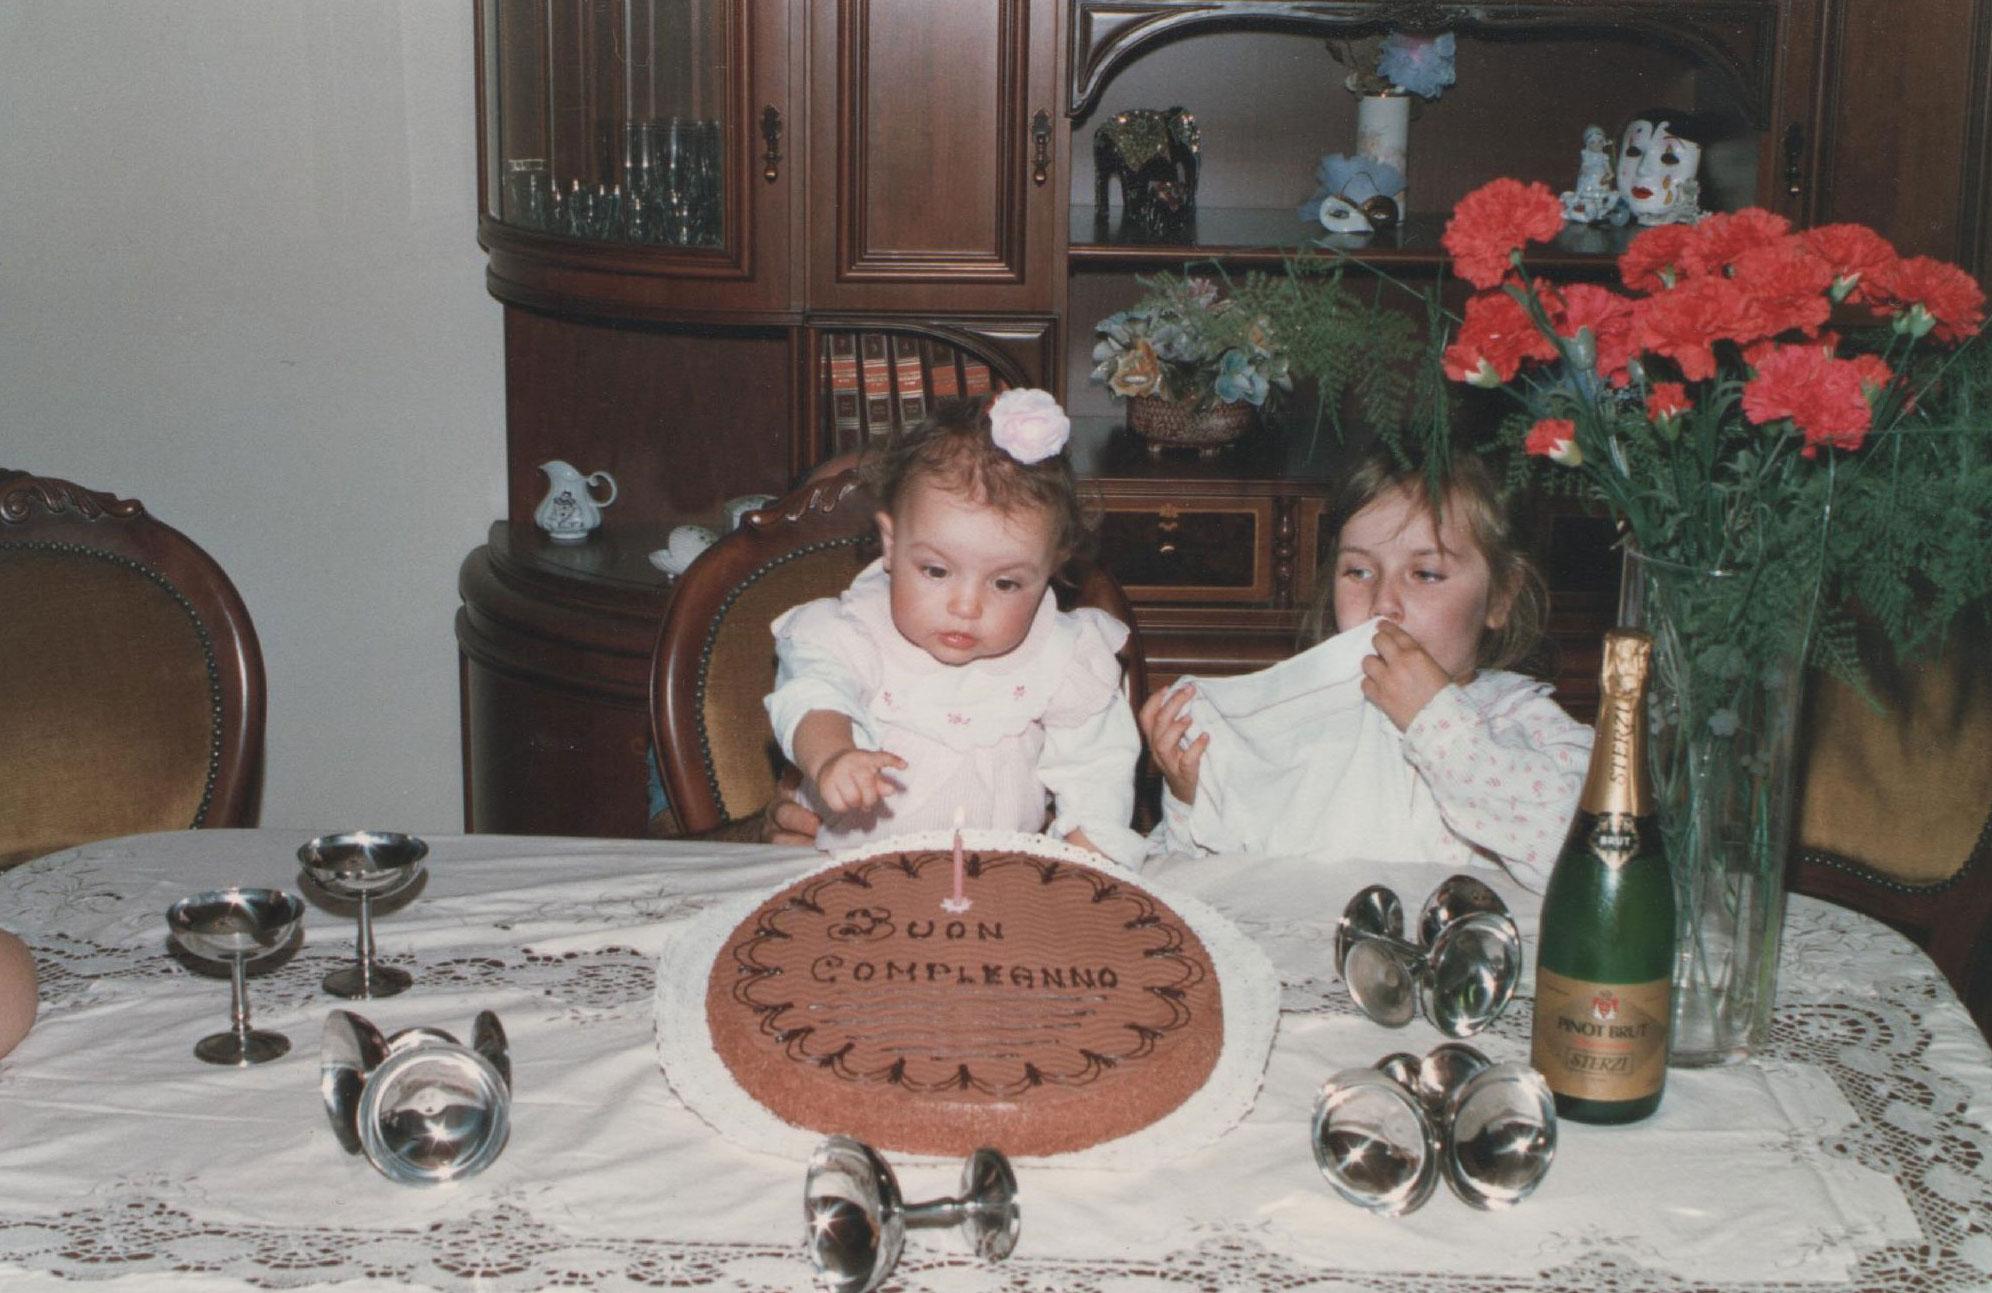 2014 09 29-sara-birthday-karotina-baby-compleanno